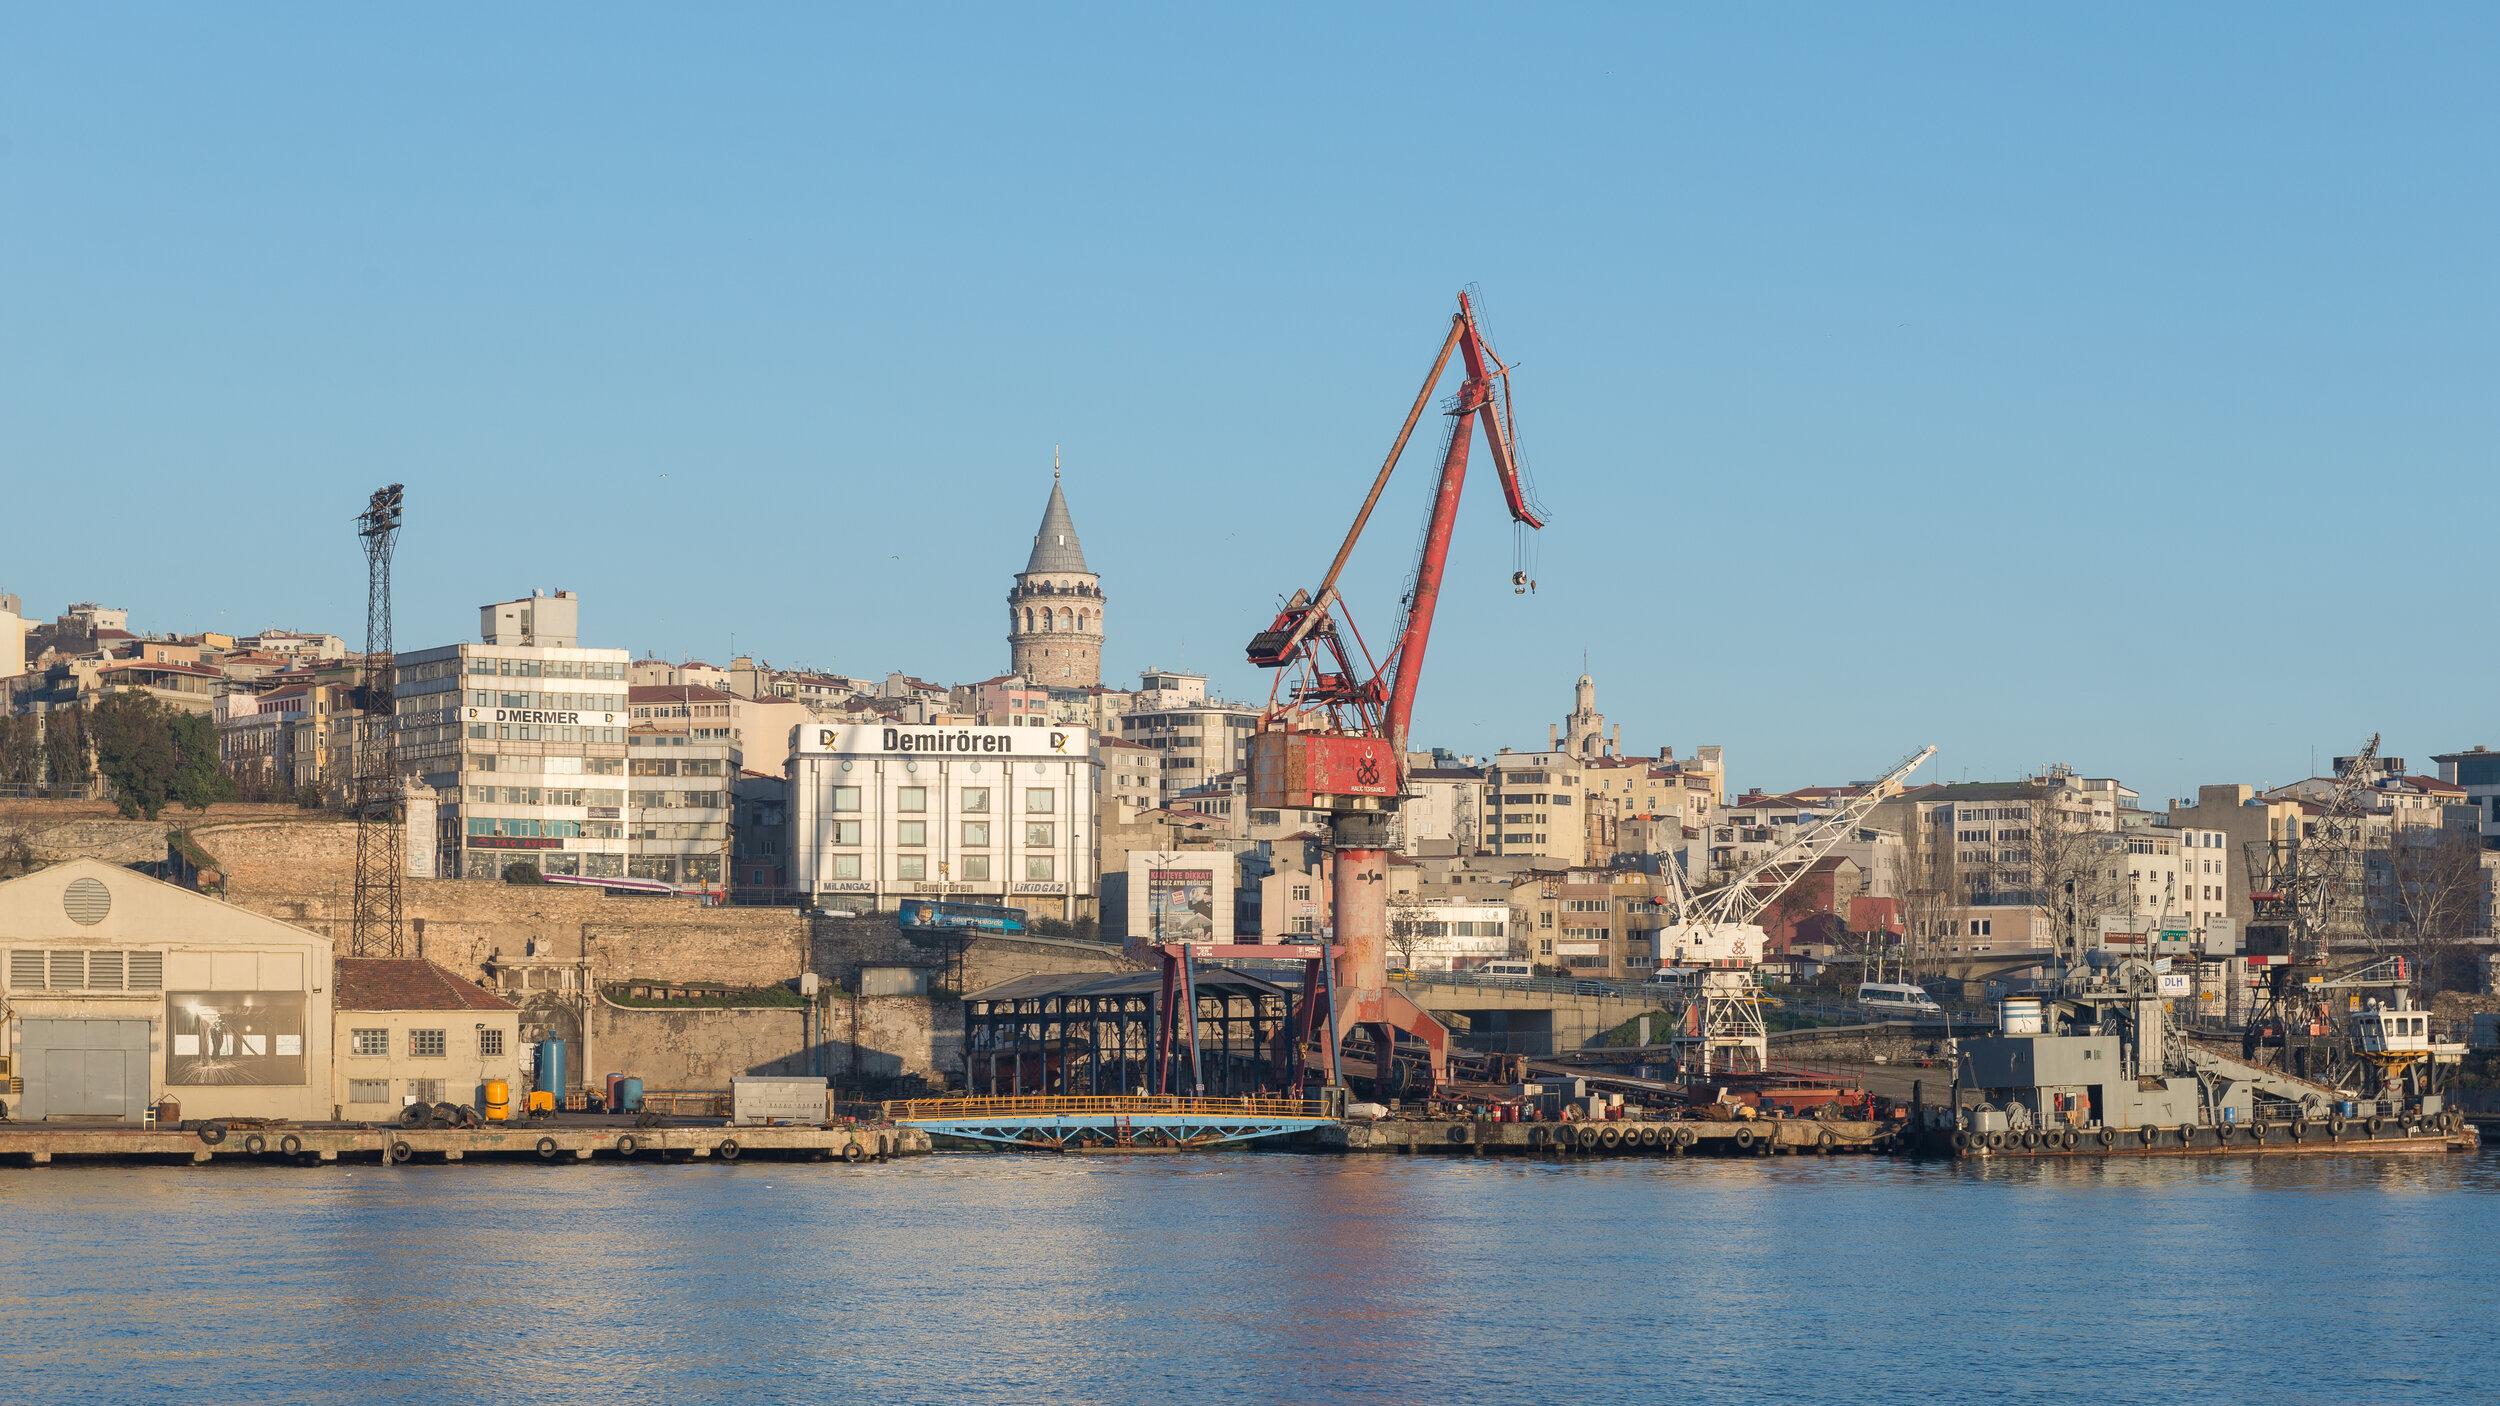 Figure 2. Haliç Shipyards as seen in March 2013. (Photograph: Arild Wågen, WikiZero)